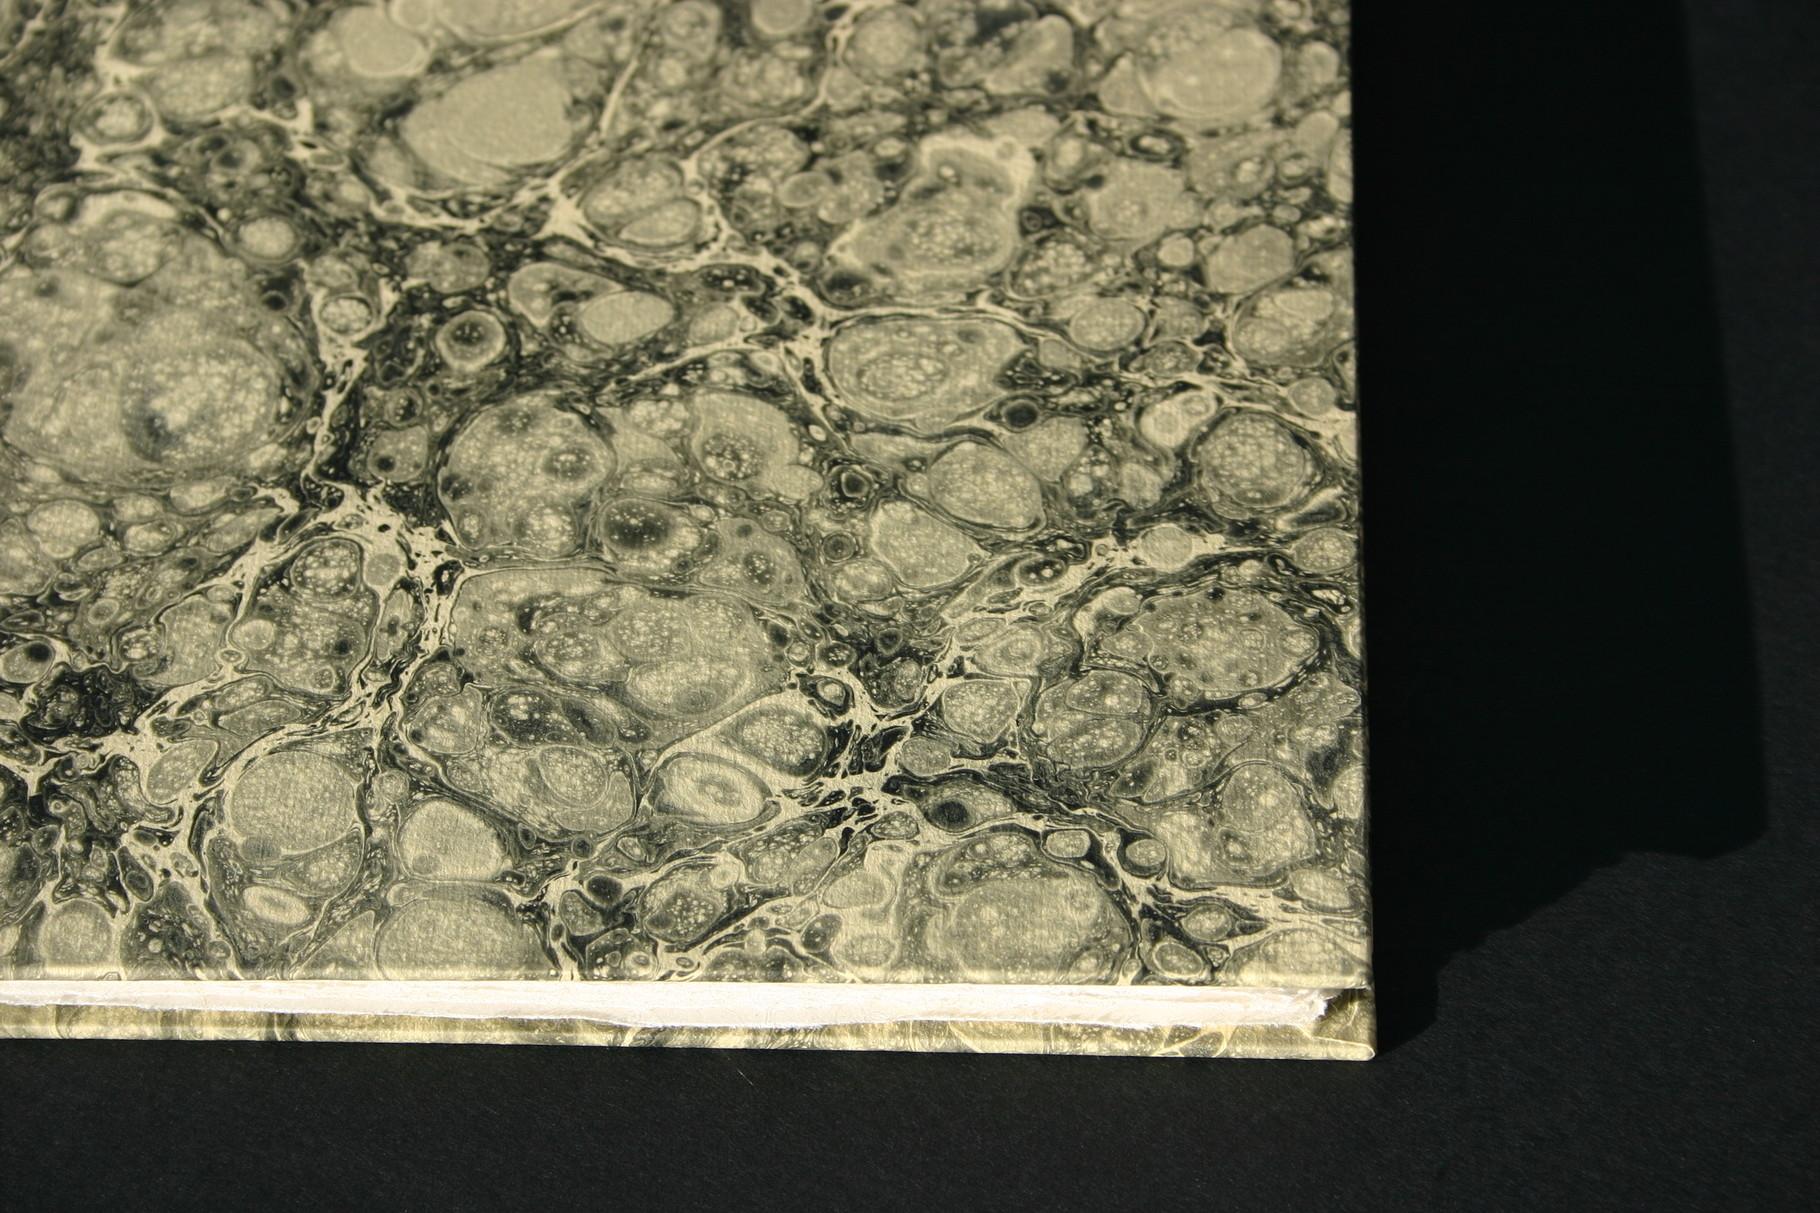 Gästebuch in Handmarmorpapier